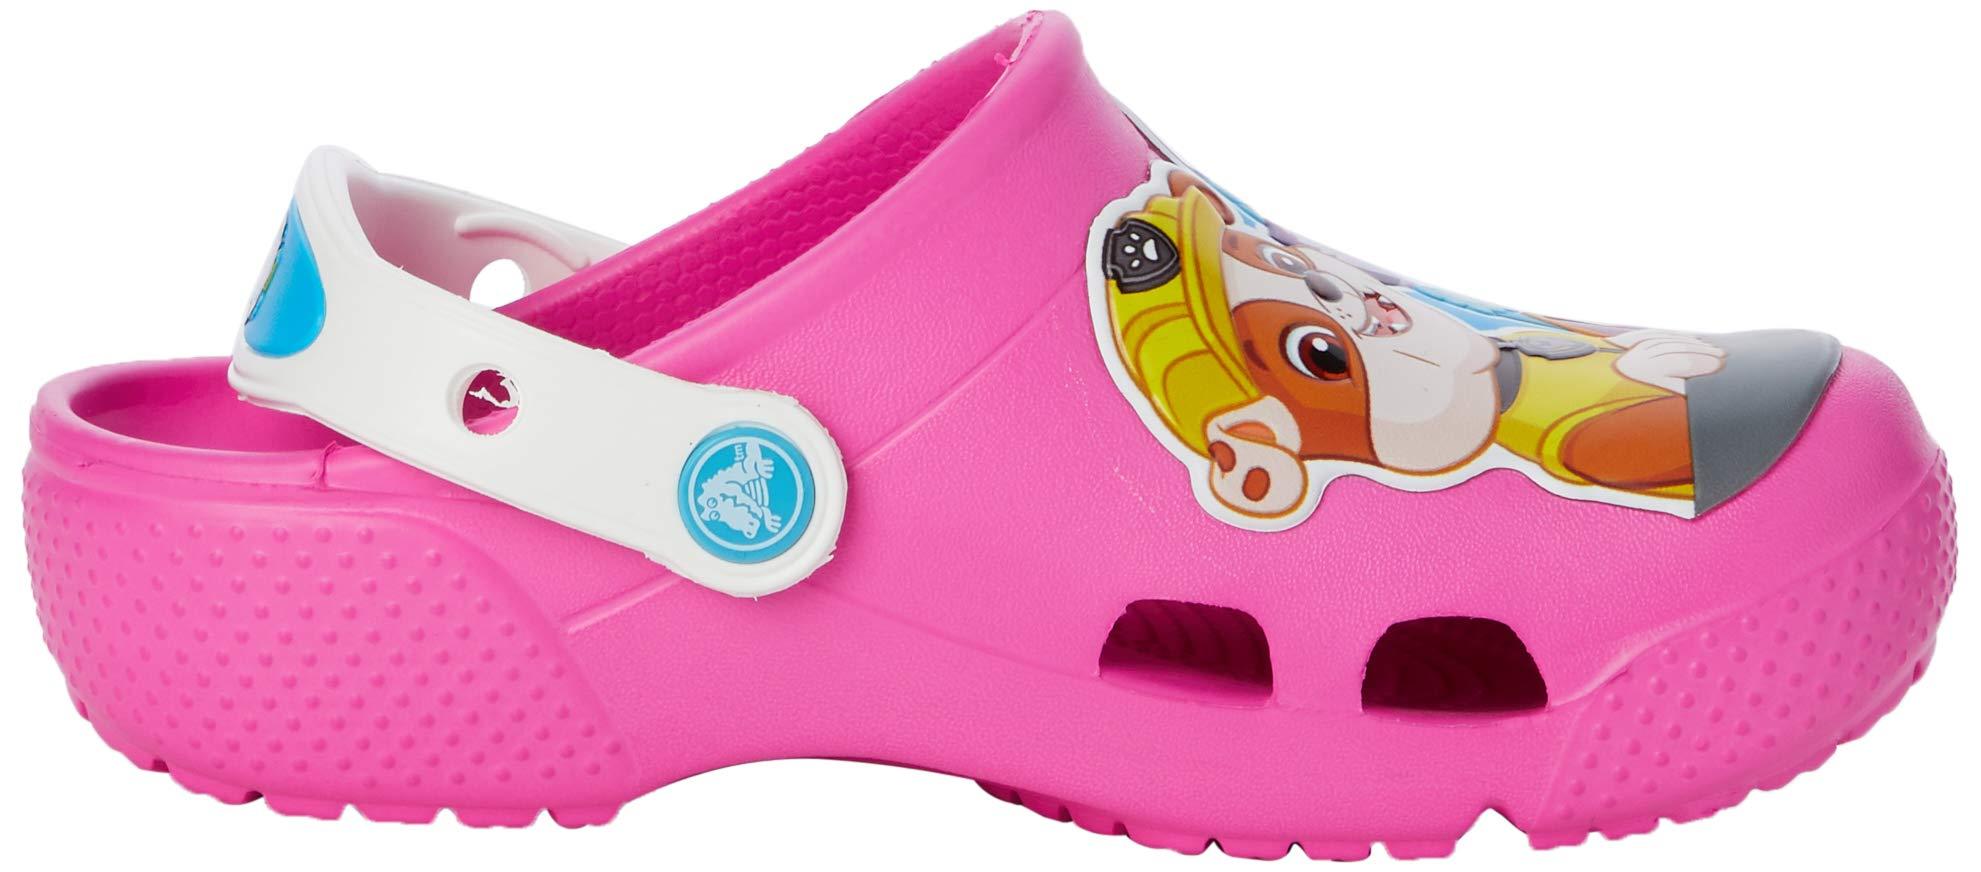 Crocs Kids Boys and Girls Paw Patrol Band Character Clog